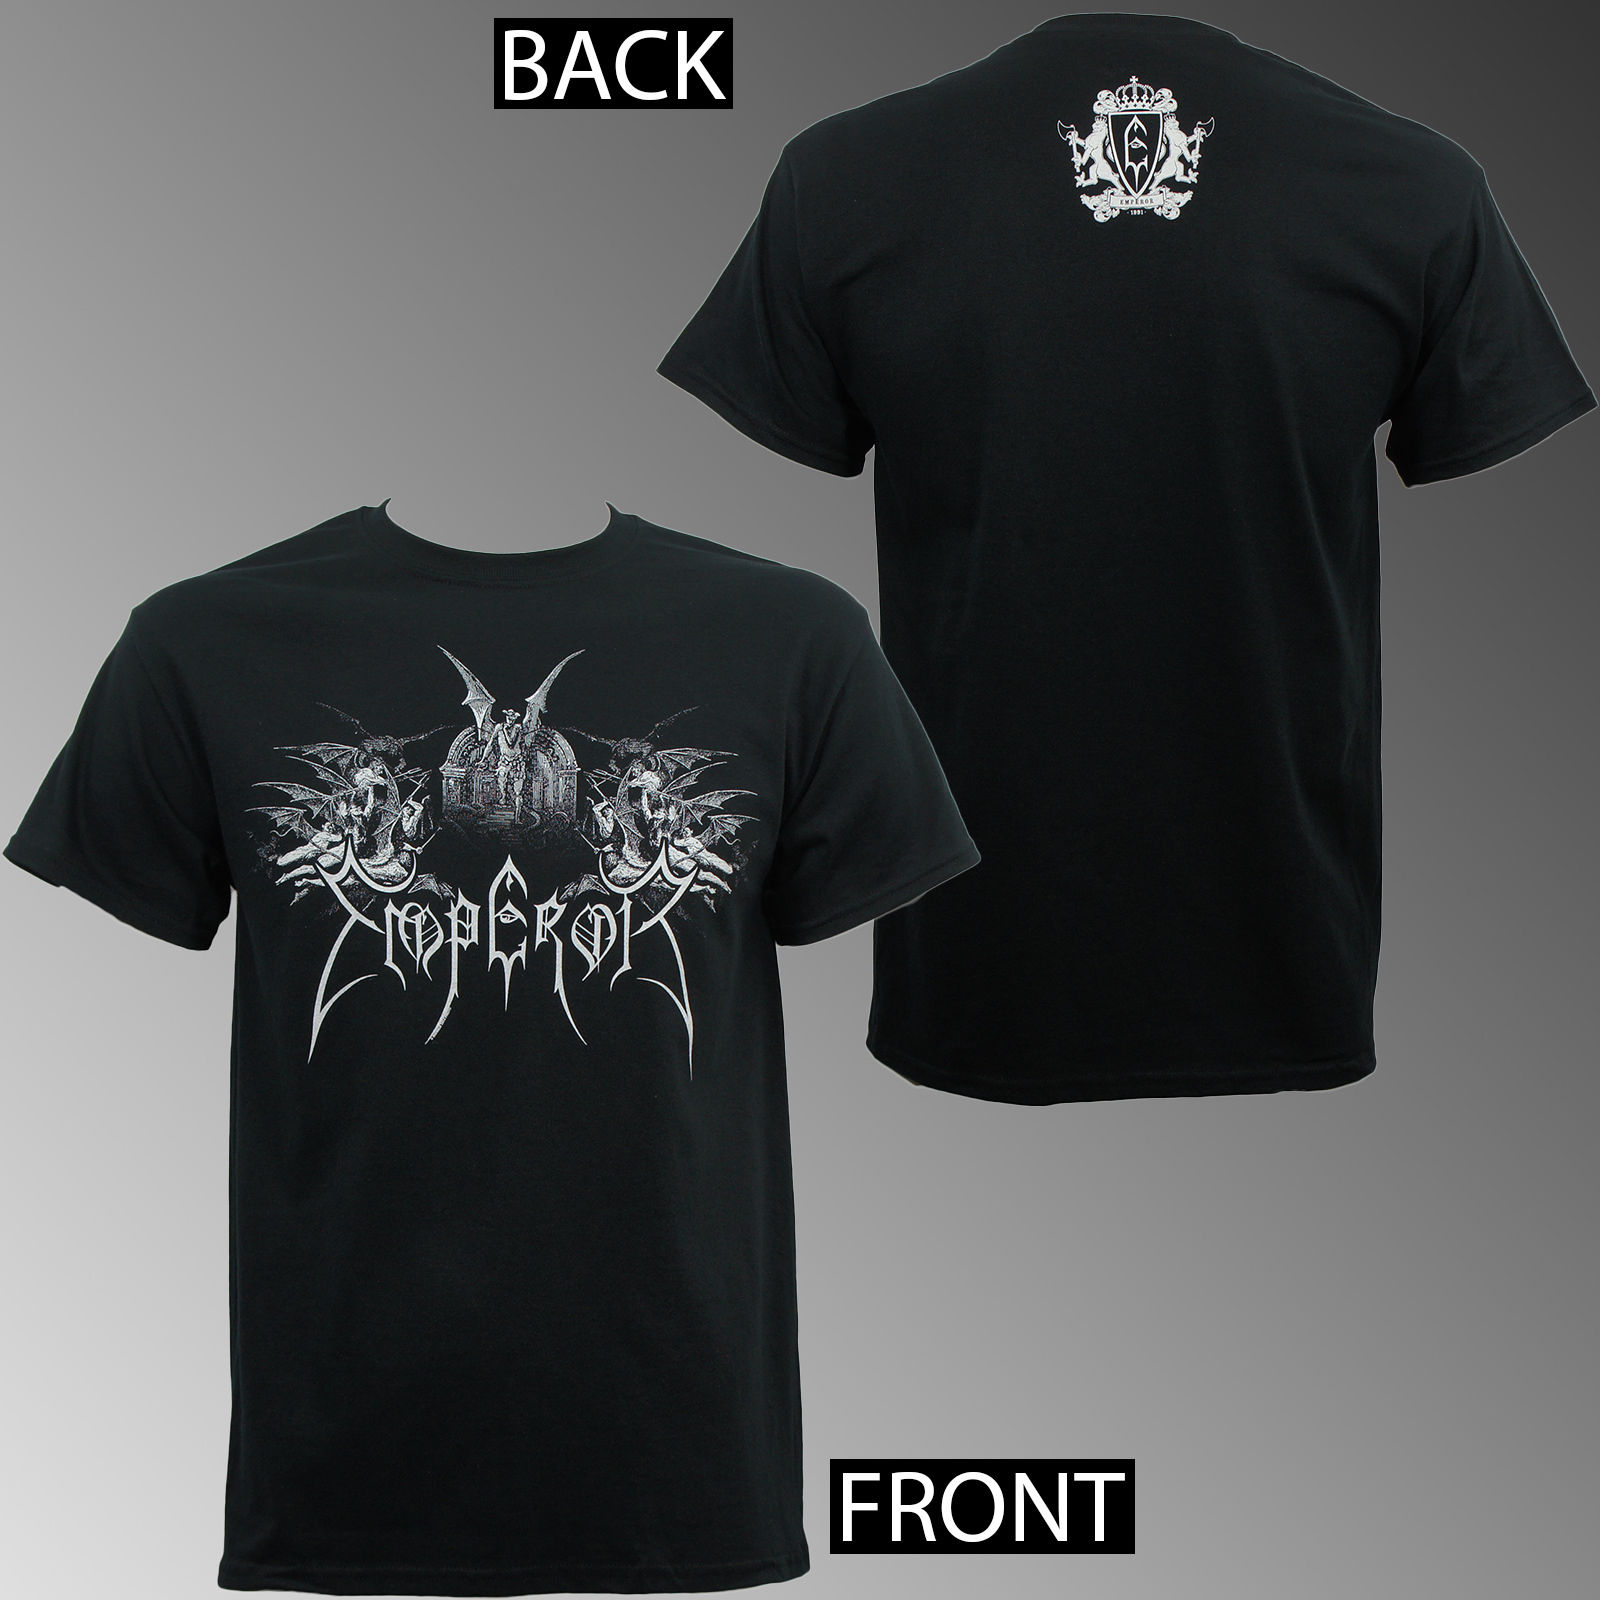 Ghost Meliora Shirt S M L XL XXL Official T-Shirt Heavy Metal Rock Band Tshirt